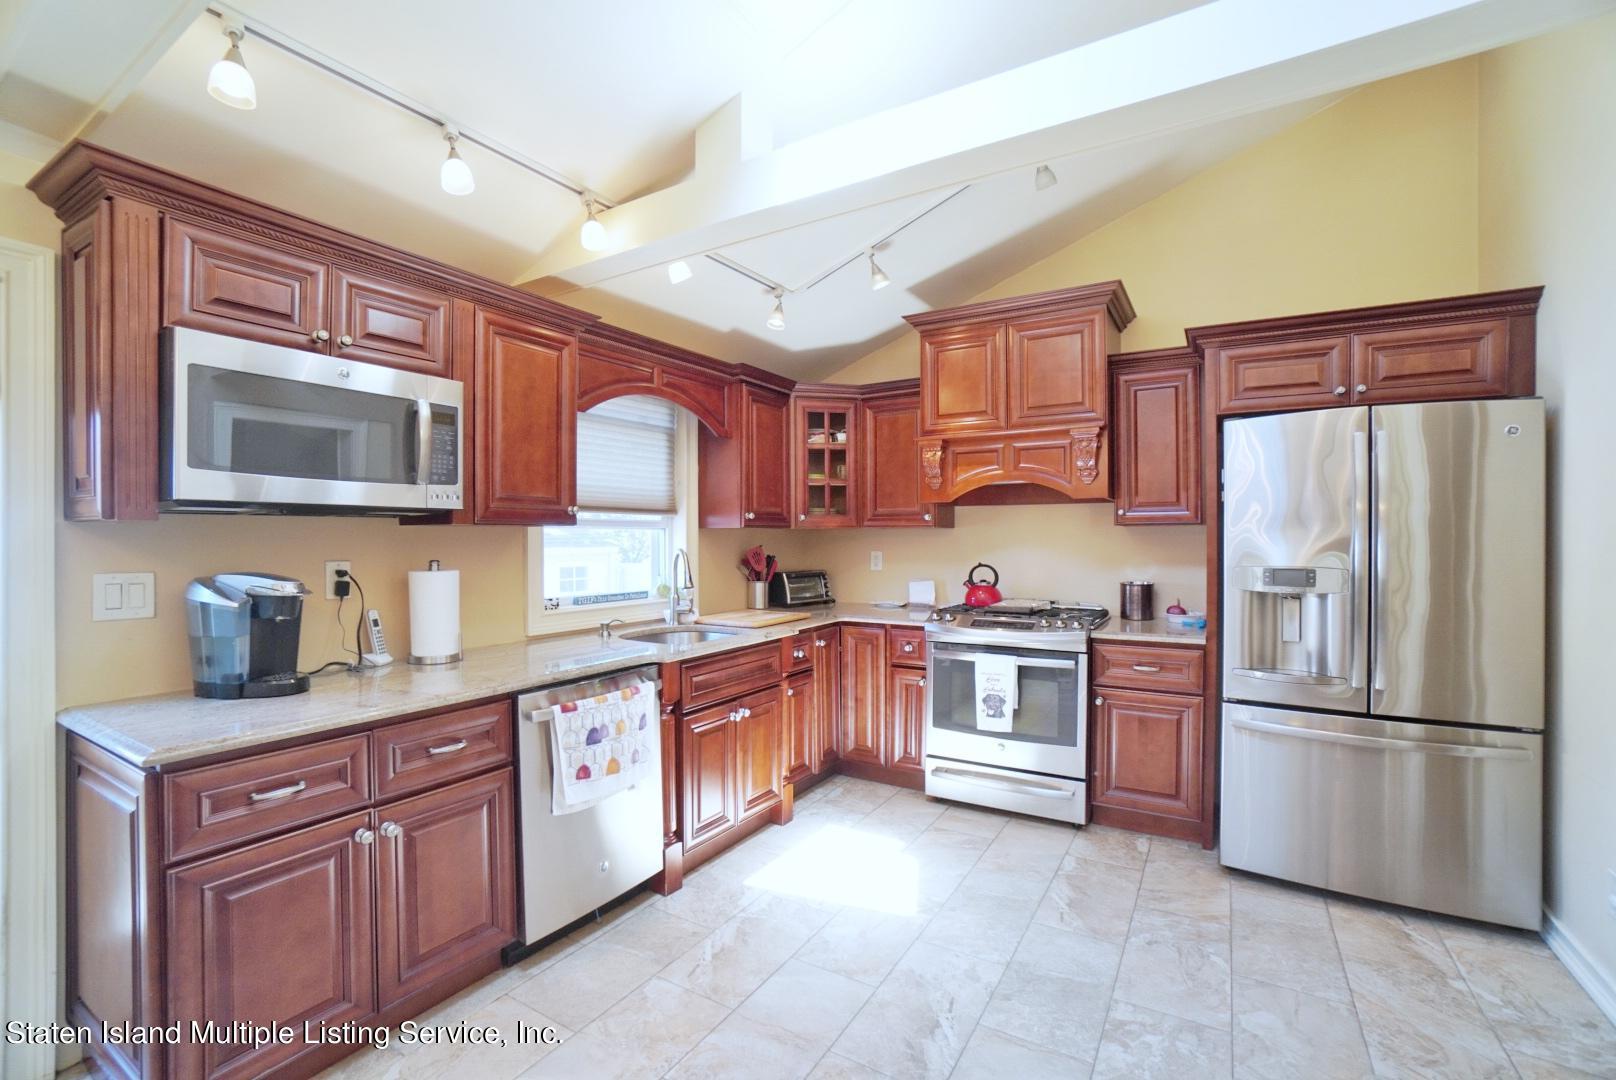 Single Family - Detached 264 Fisher Avenue  Staten Island, NY 10307, MLS-1146898-19